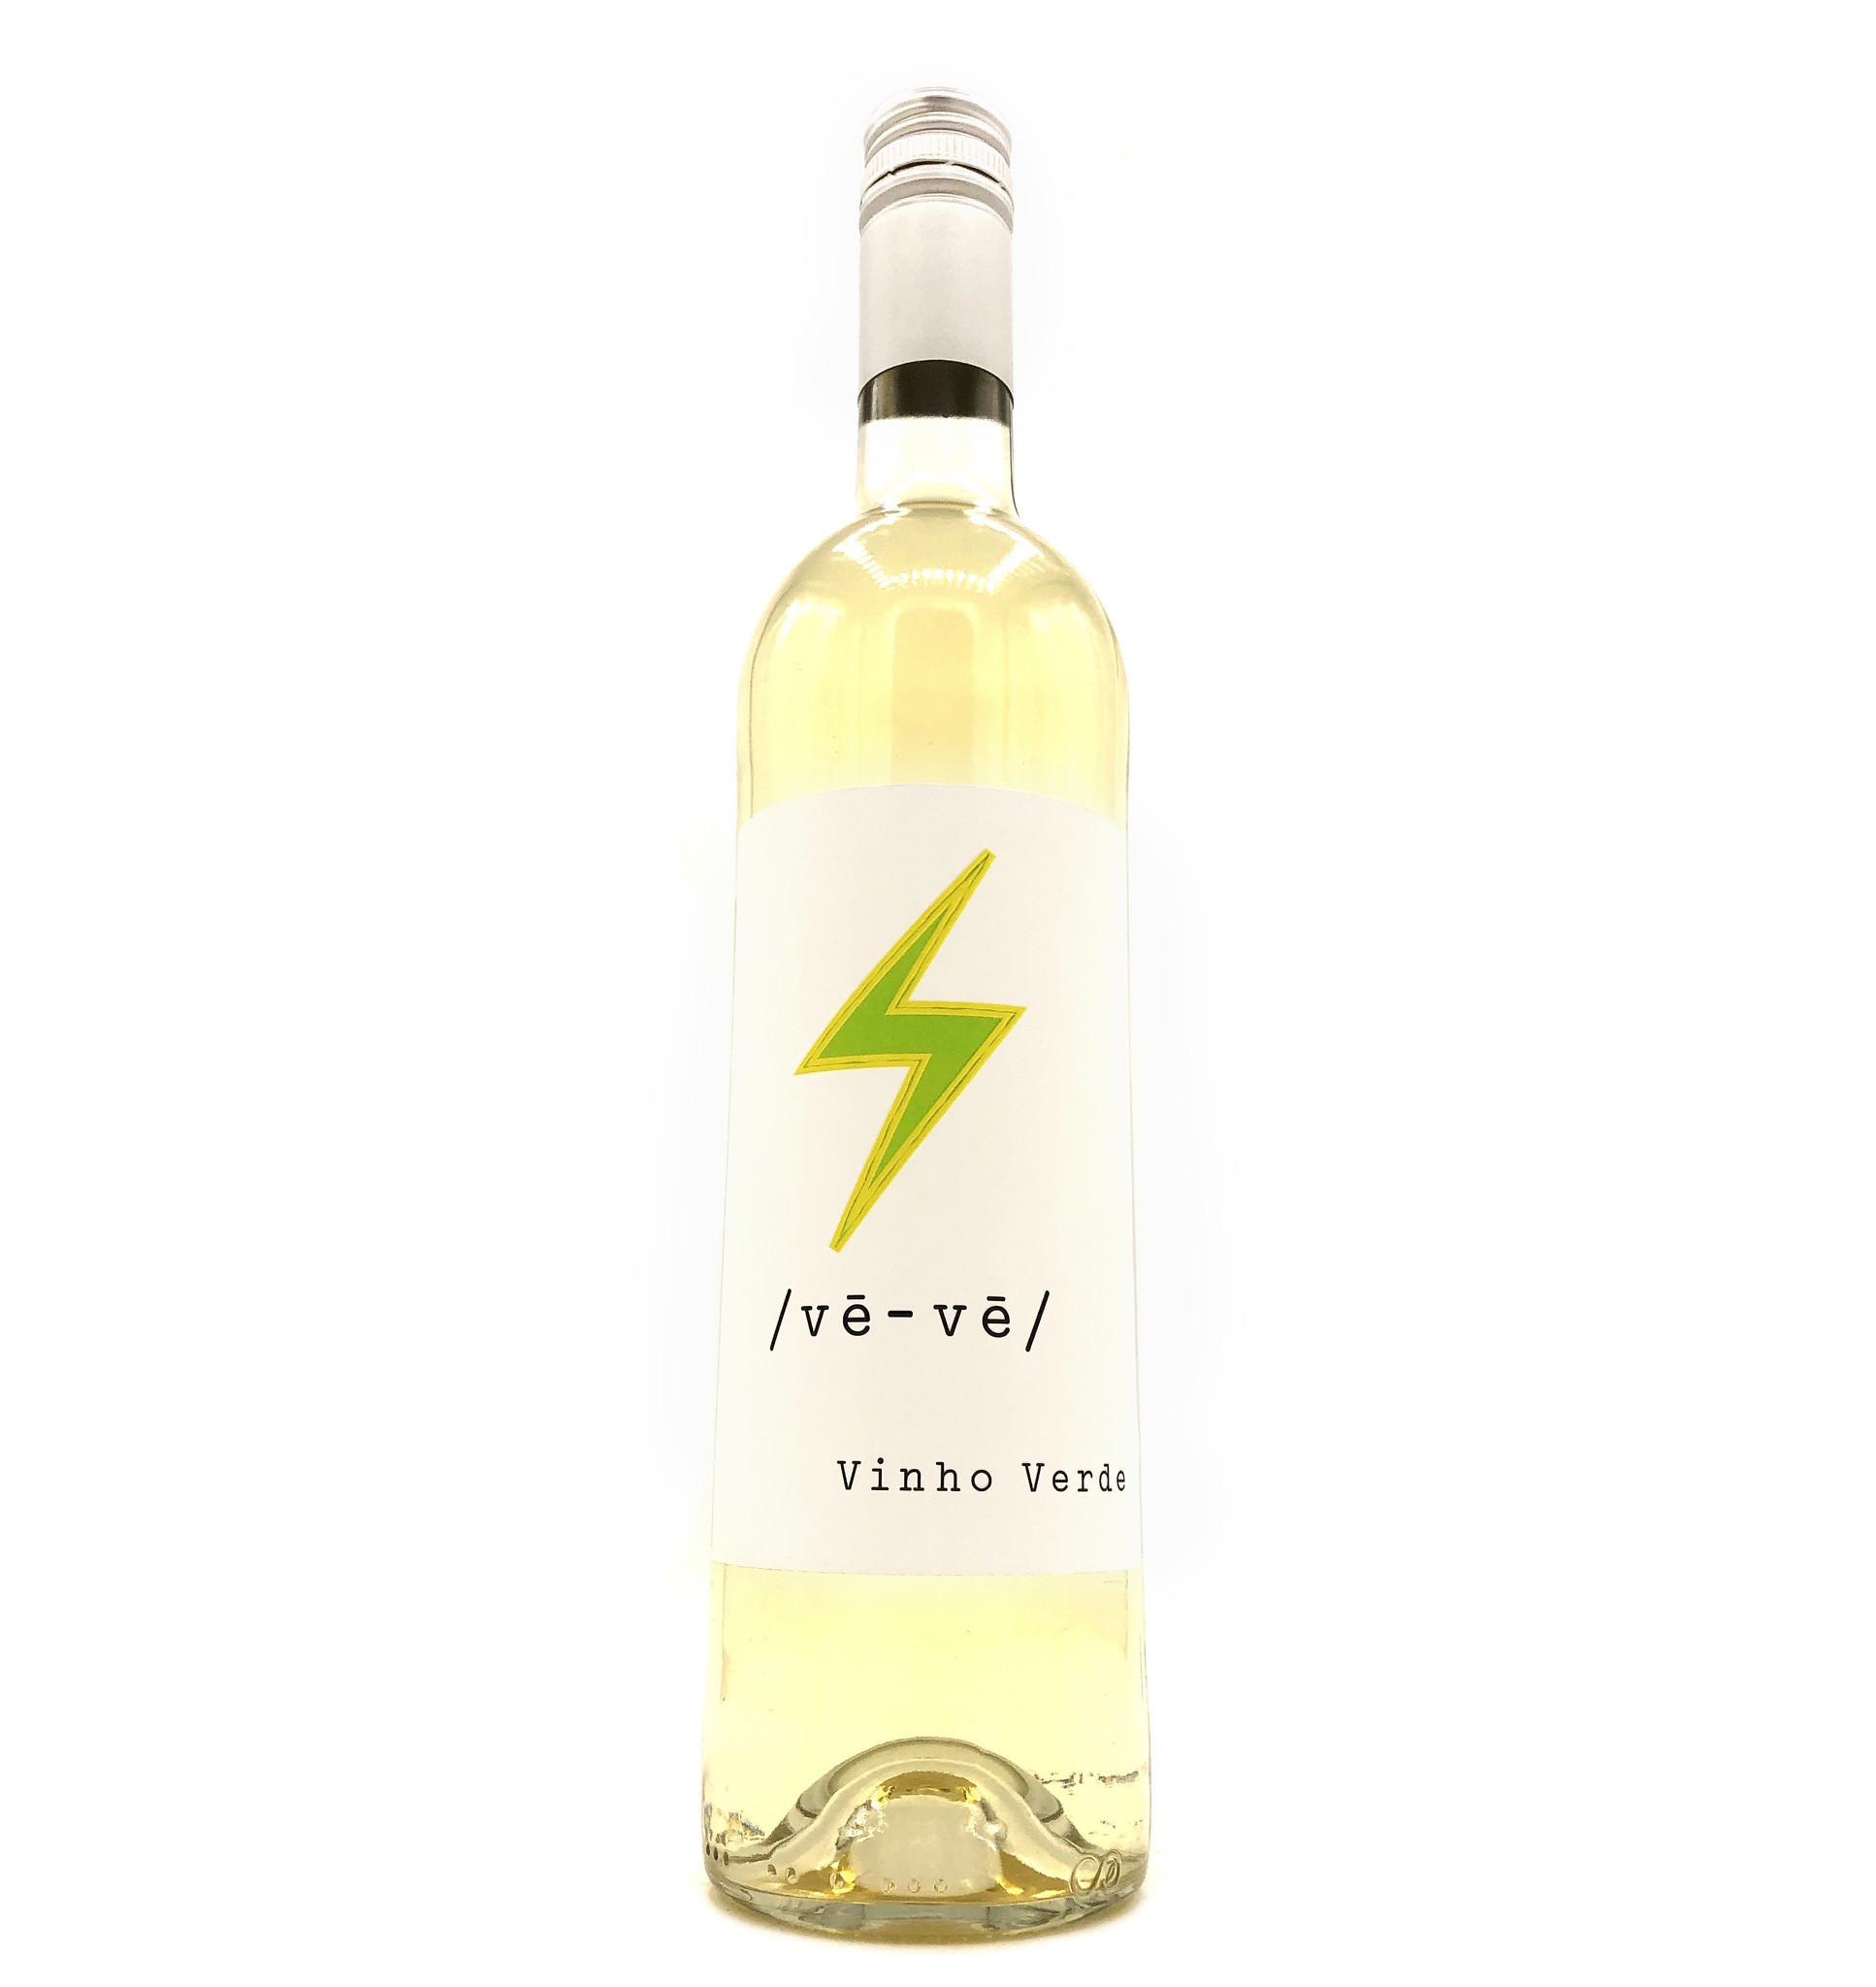 Vinho Verde 2019 Veve